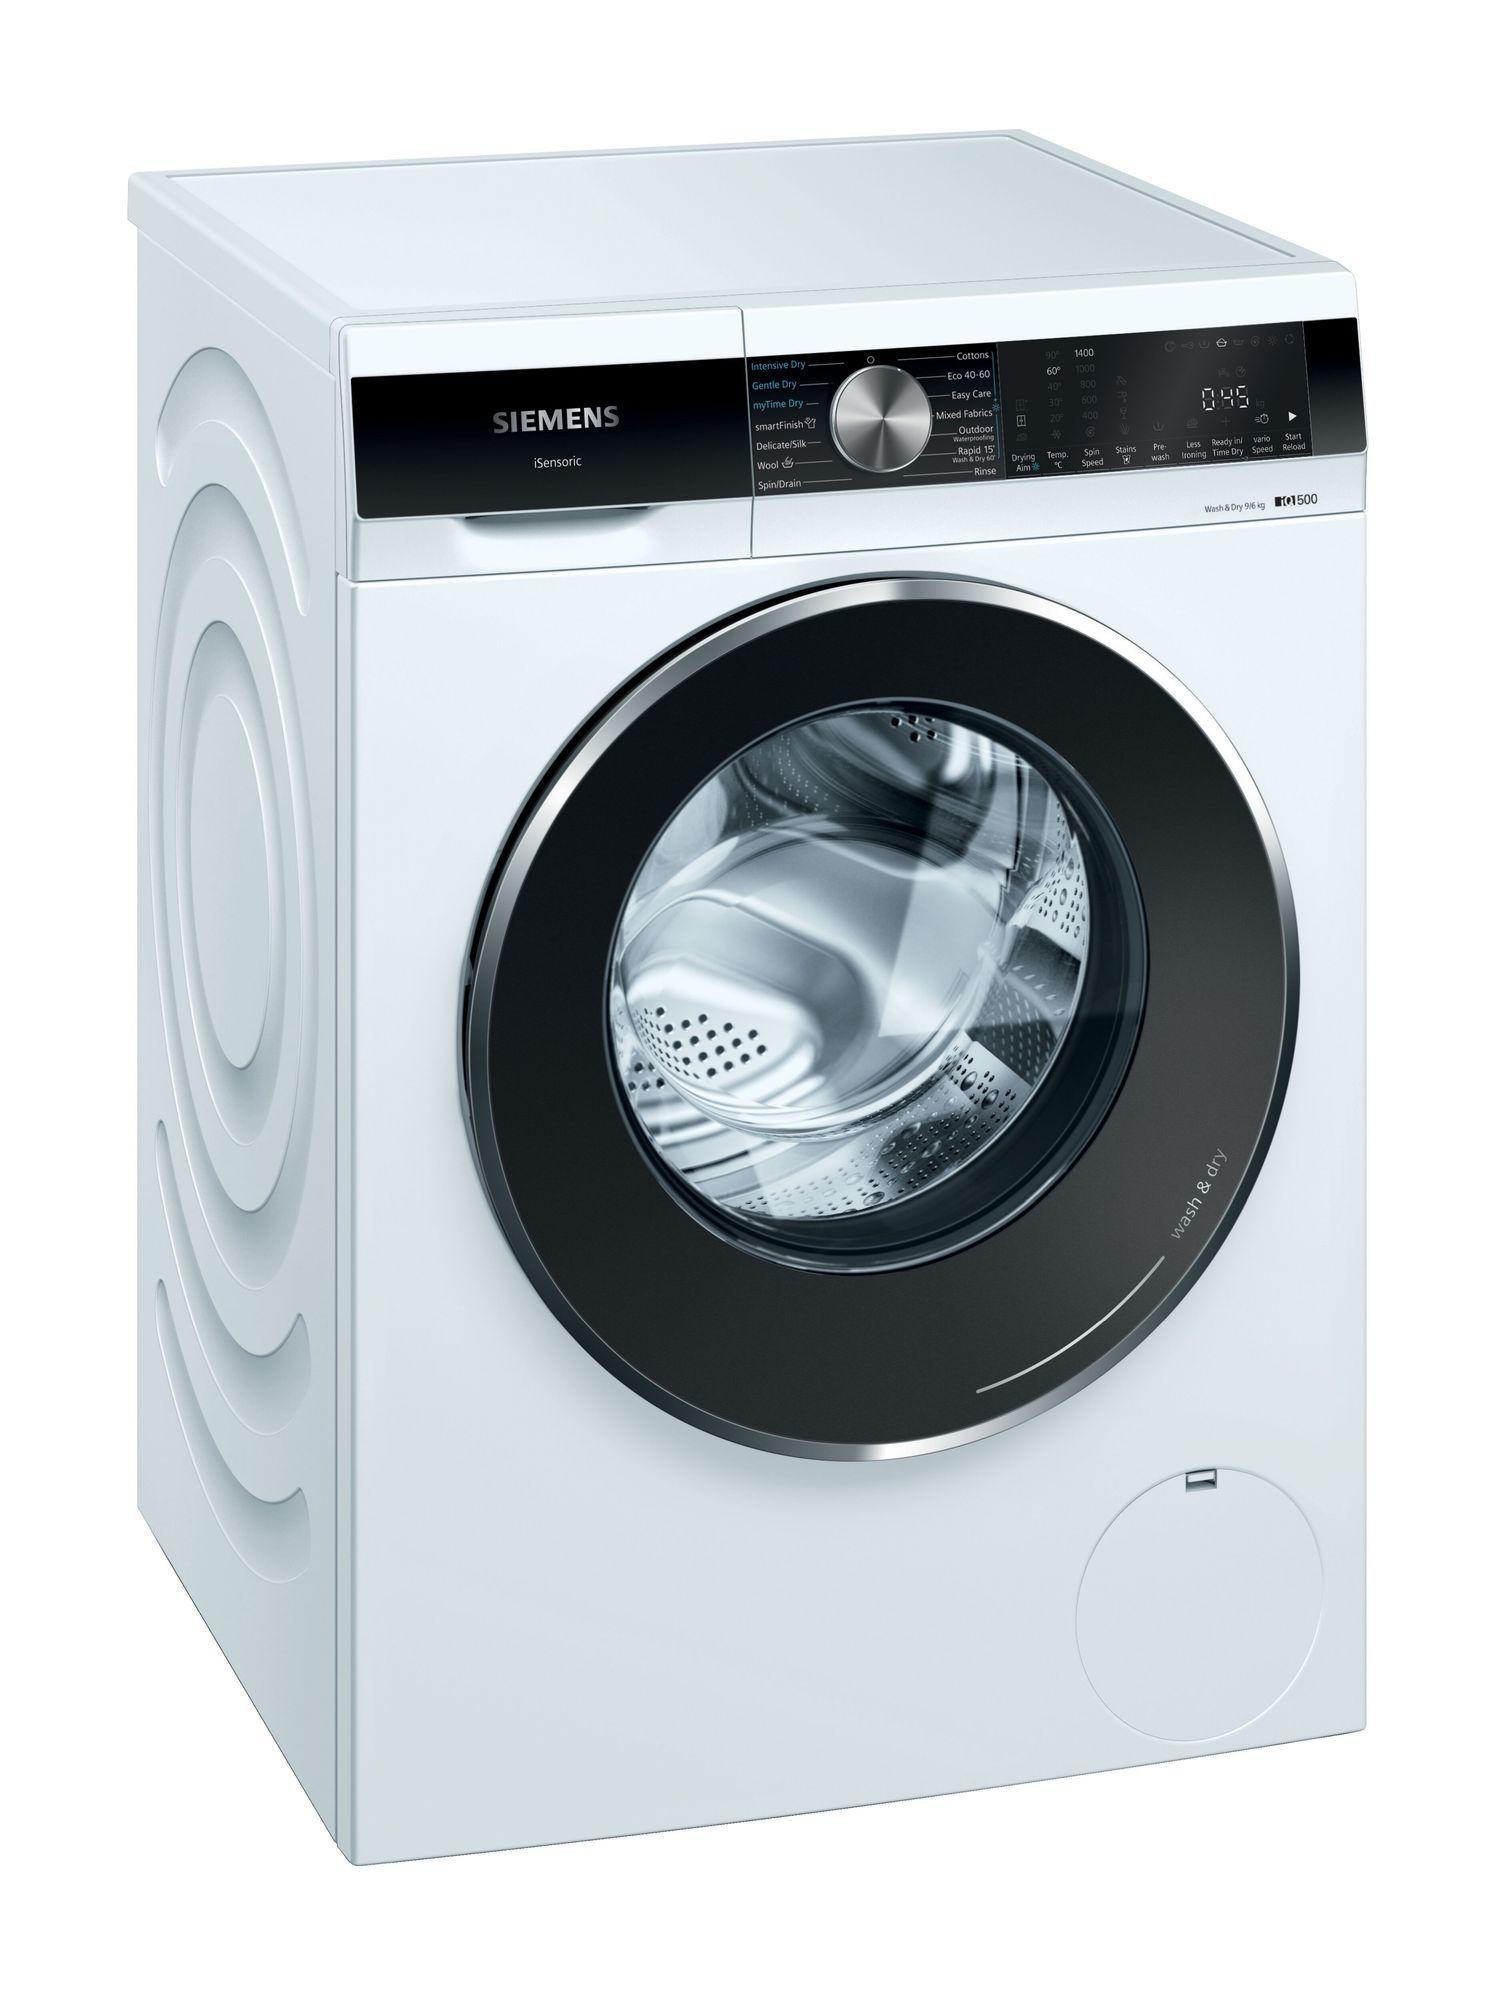 Washer Dryers iQ500 WN44G290GB 9Kg Wash 6Kg Dry 1400 Spin Washer Dryer | White